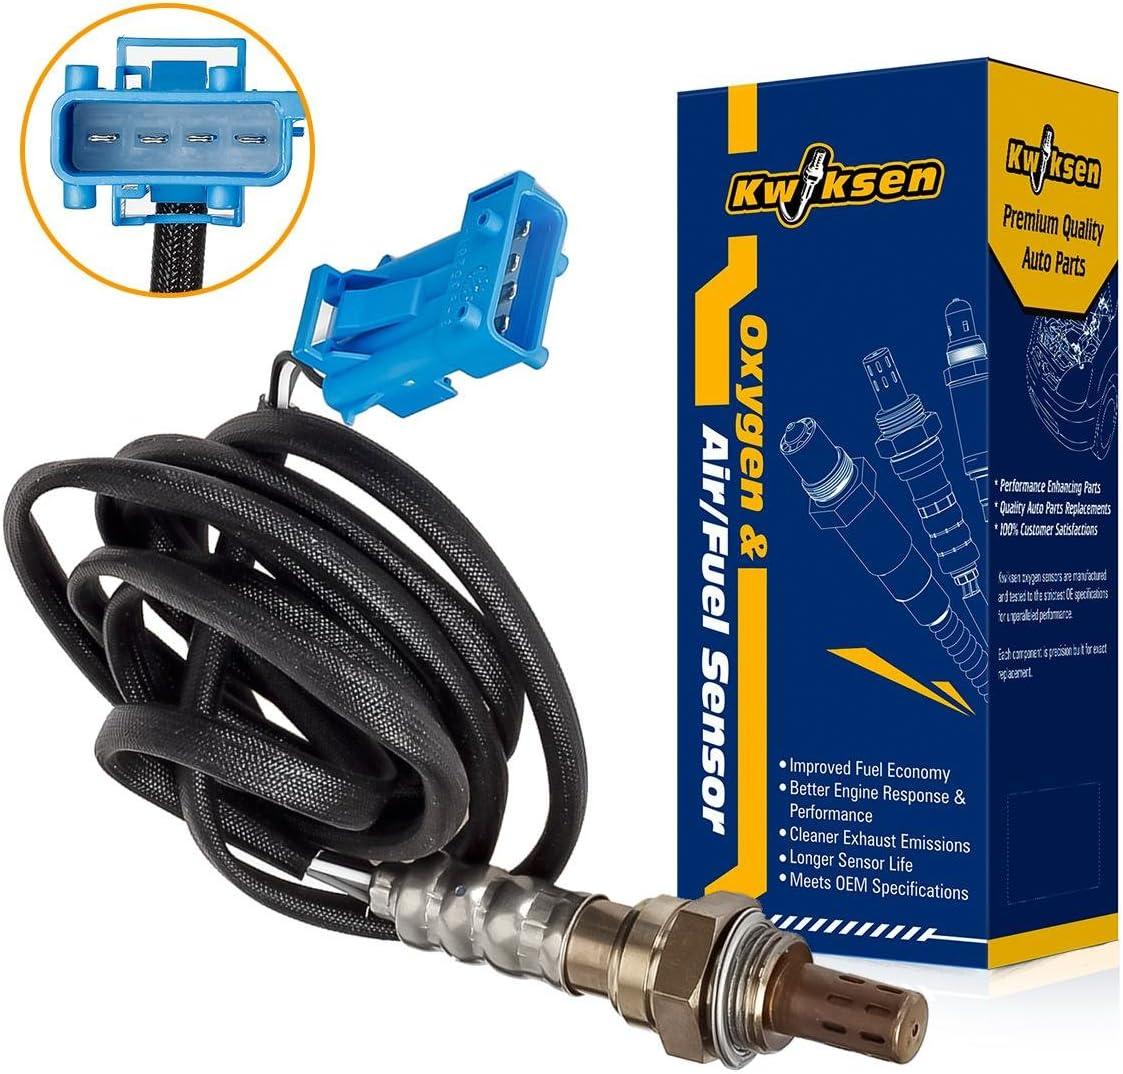 Kwiksen Heated O2 Oxygen Sensor Downstream 234-4488 Replacement for Mini Cooper Countryman L4-1.6L 2011 2012 2013 2014 2015